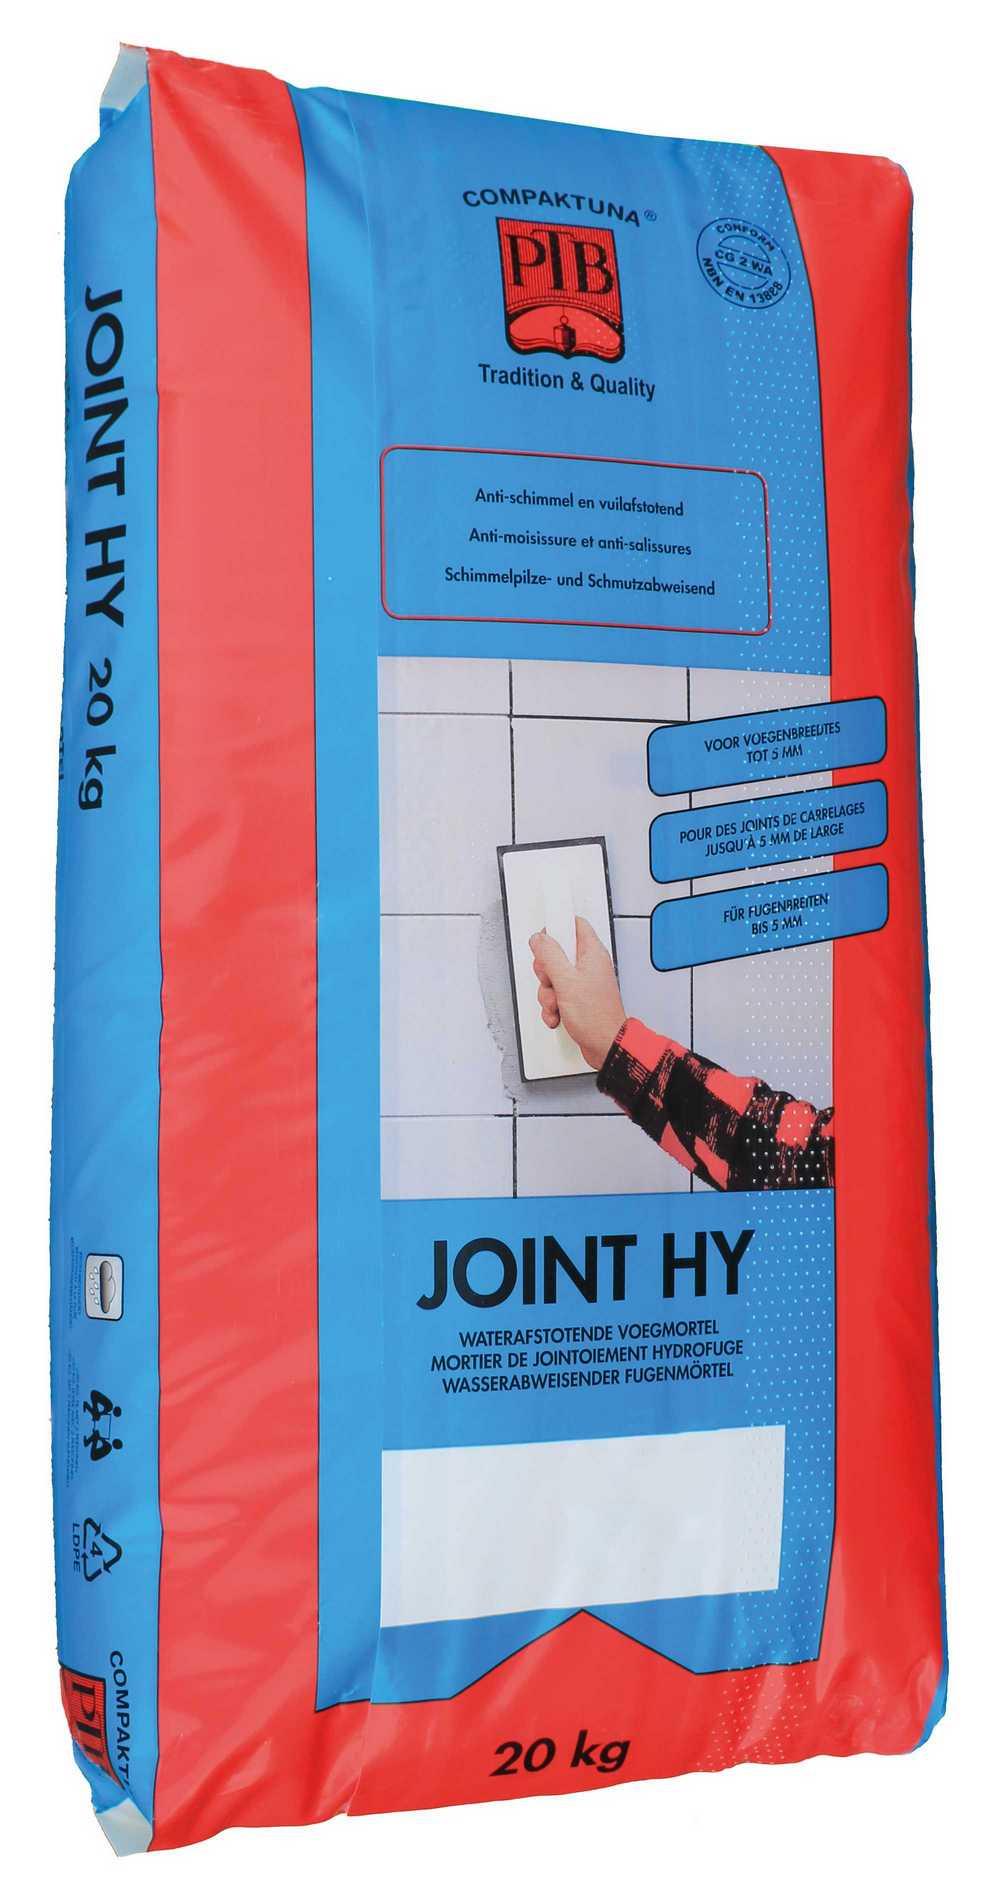 P.t.b.-joint Hy 5kg Manhattan